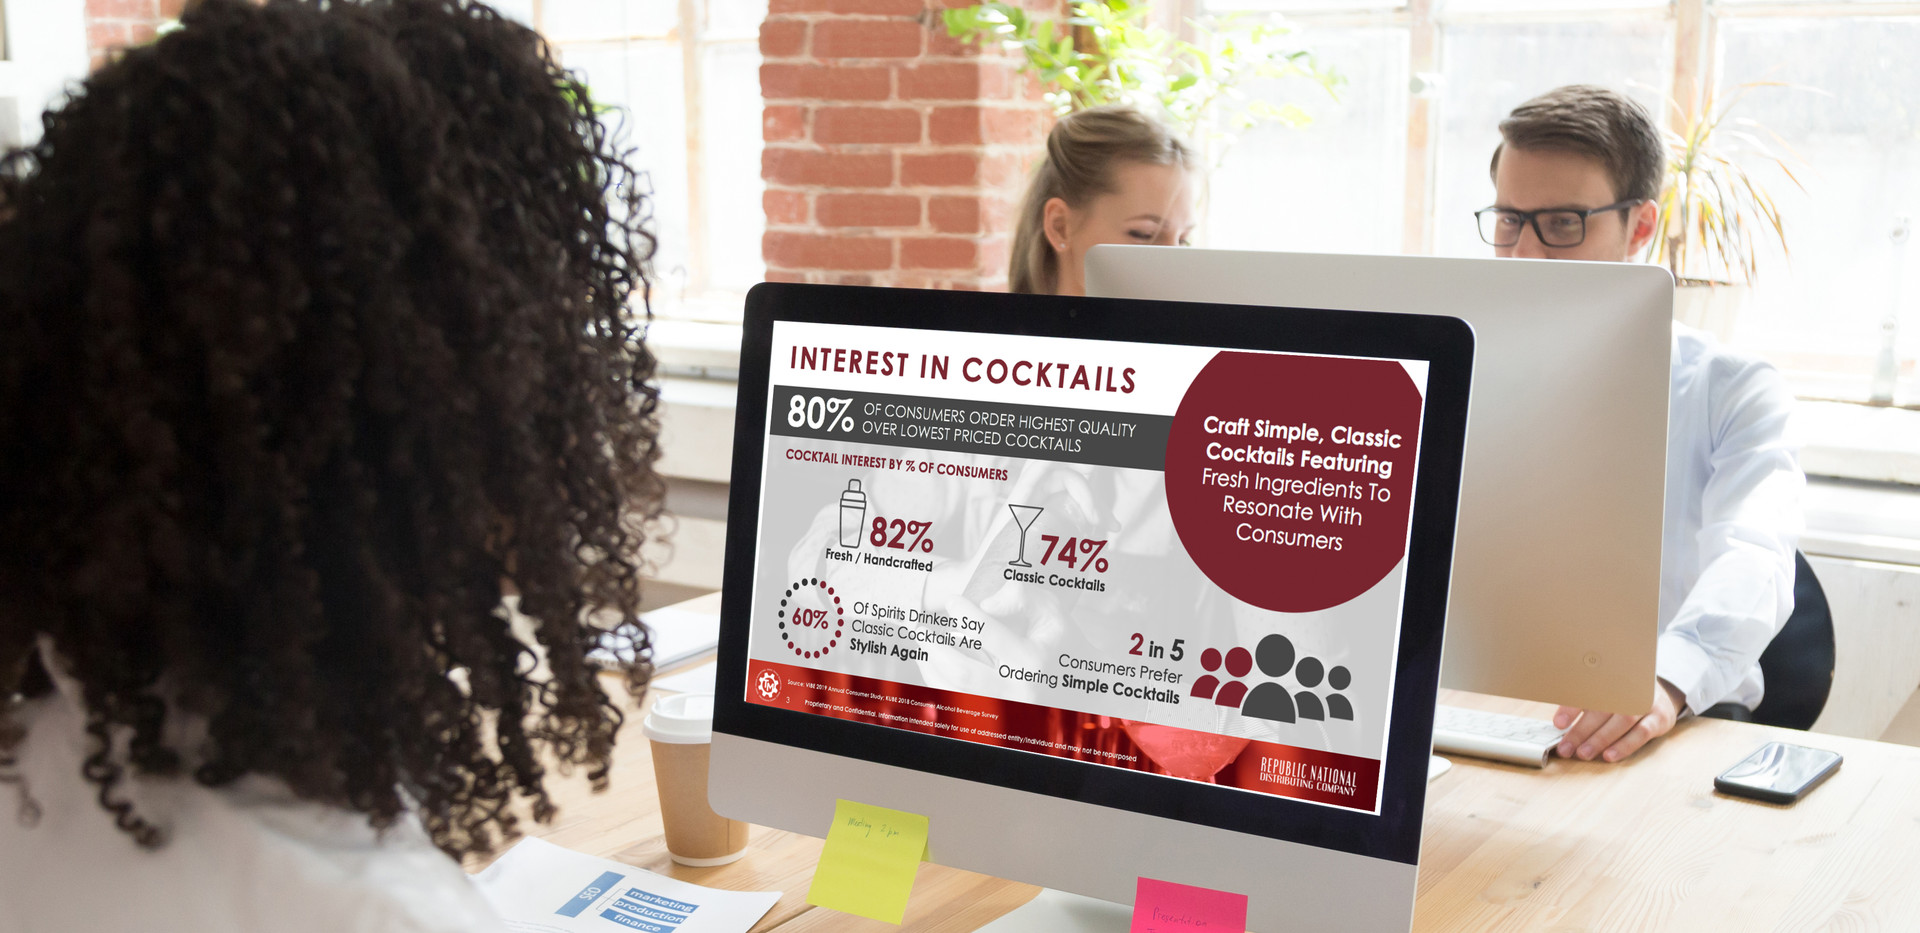 interest in cocktails.jpg